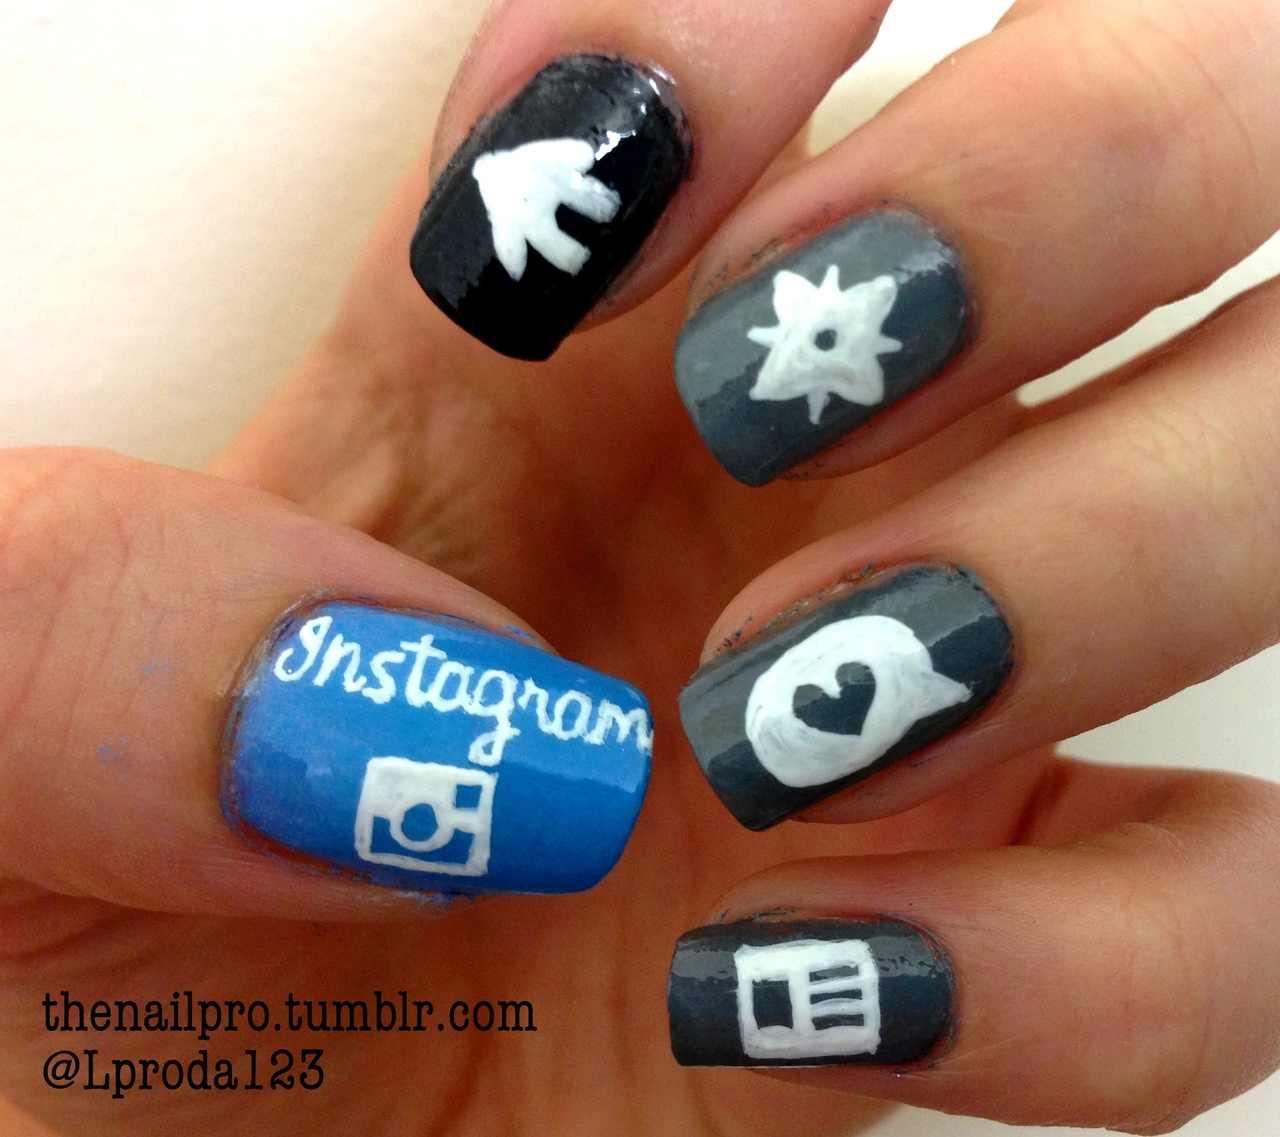 Instagram - Nails, Nail Art Photo (35016632) - Fanpop